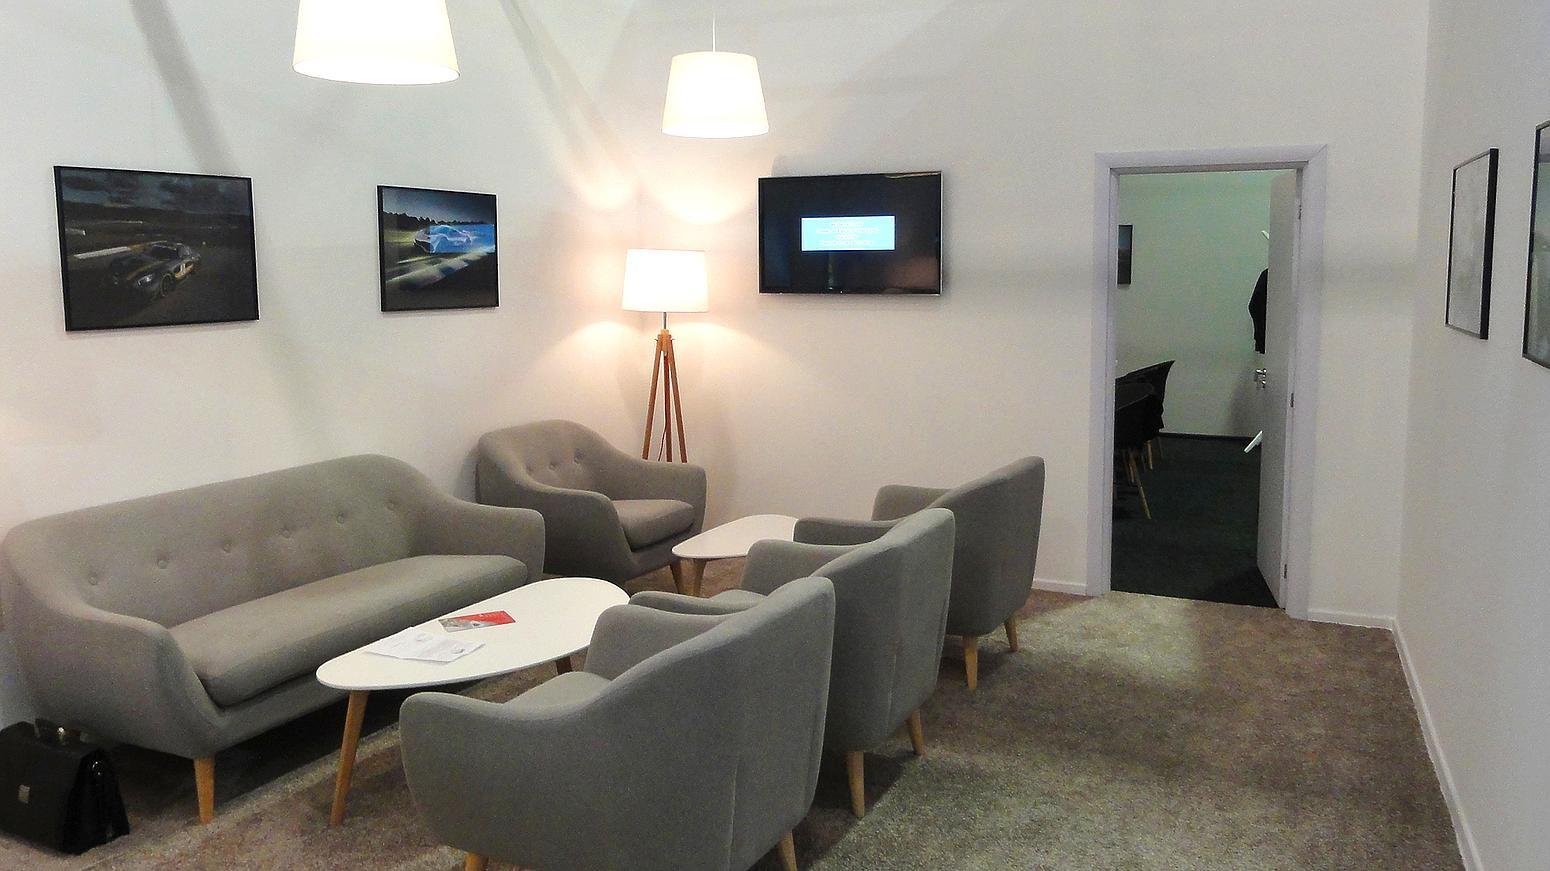 Mercedes exhibition booth, stand, interior